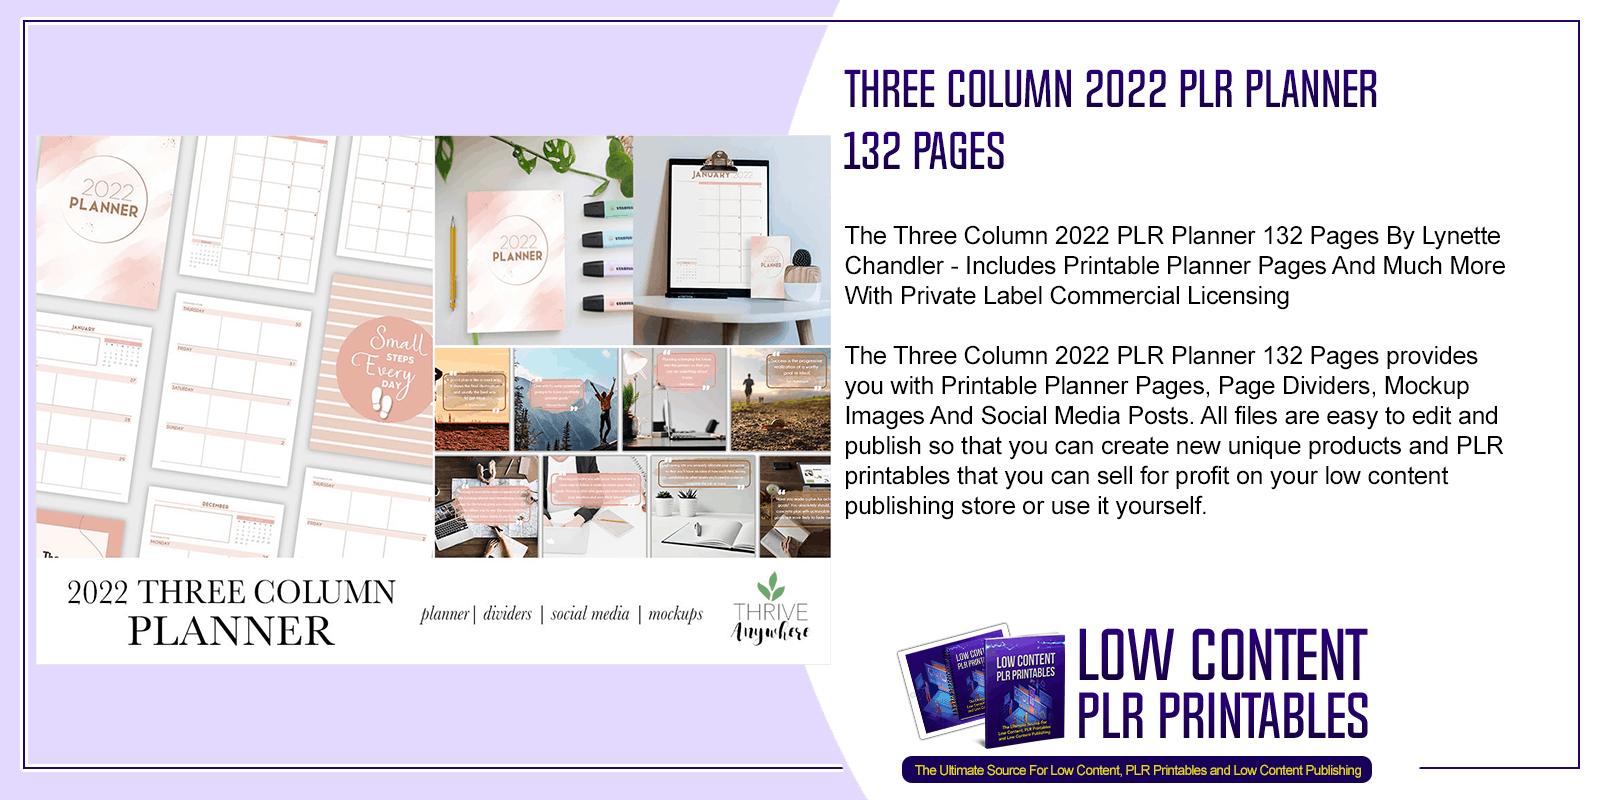 Three Column 2022 PLR Planner 132 Pages 2